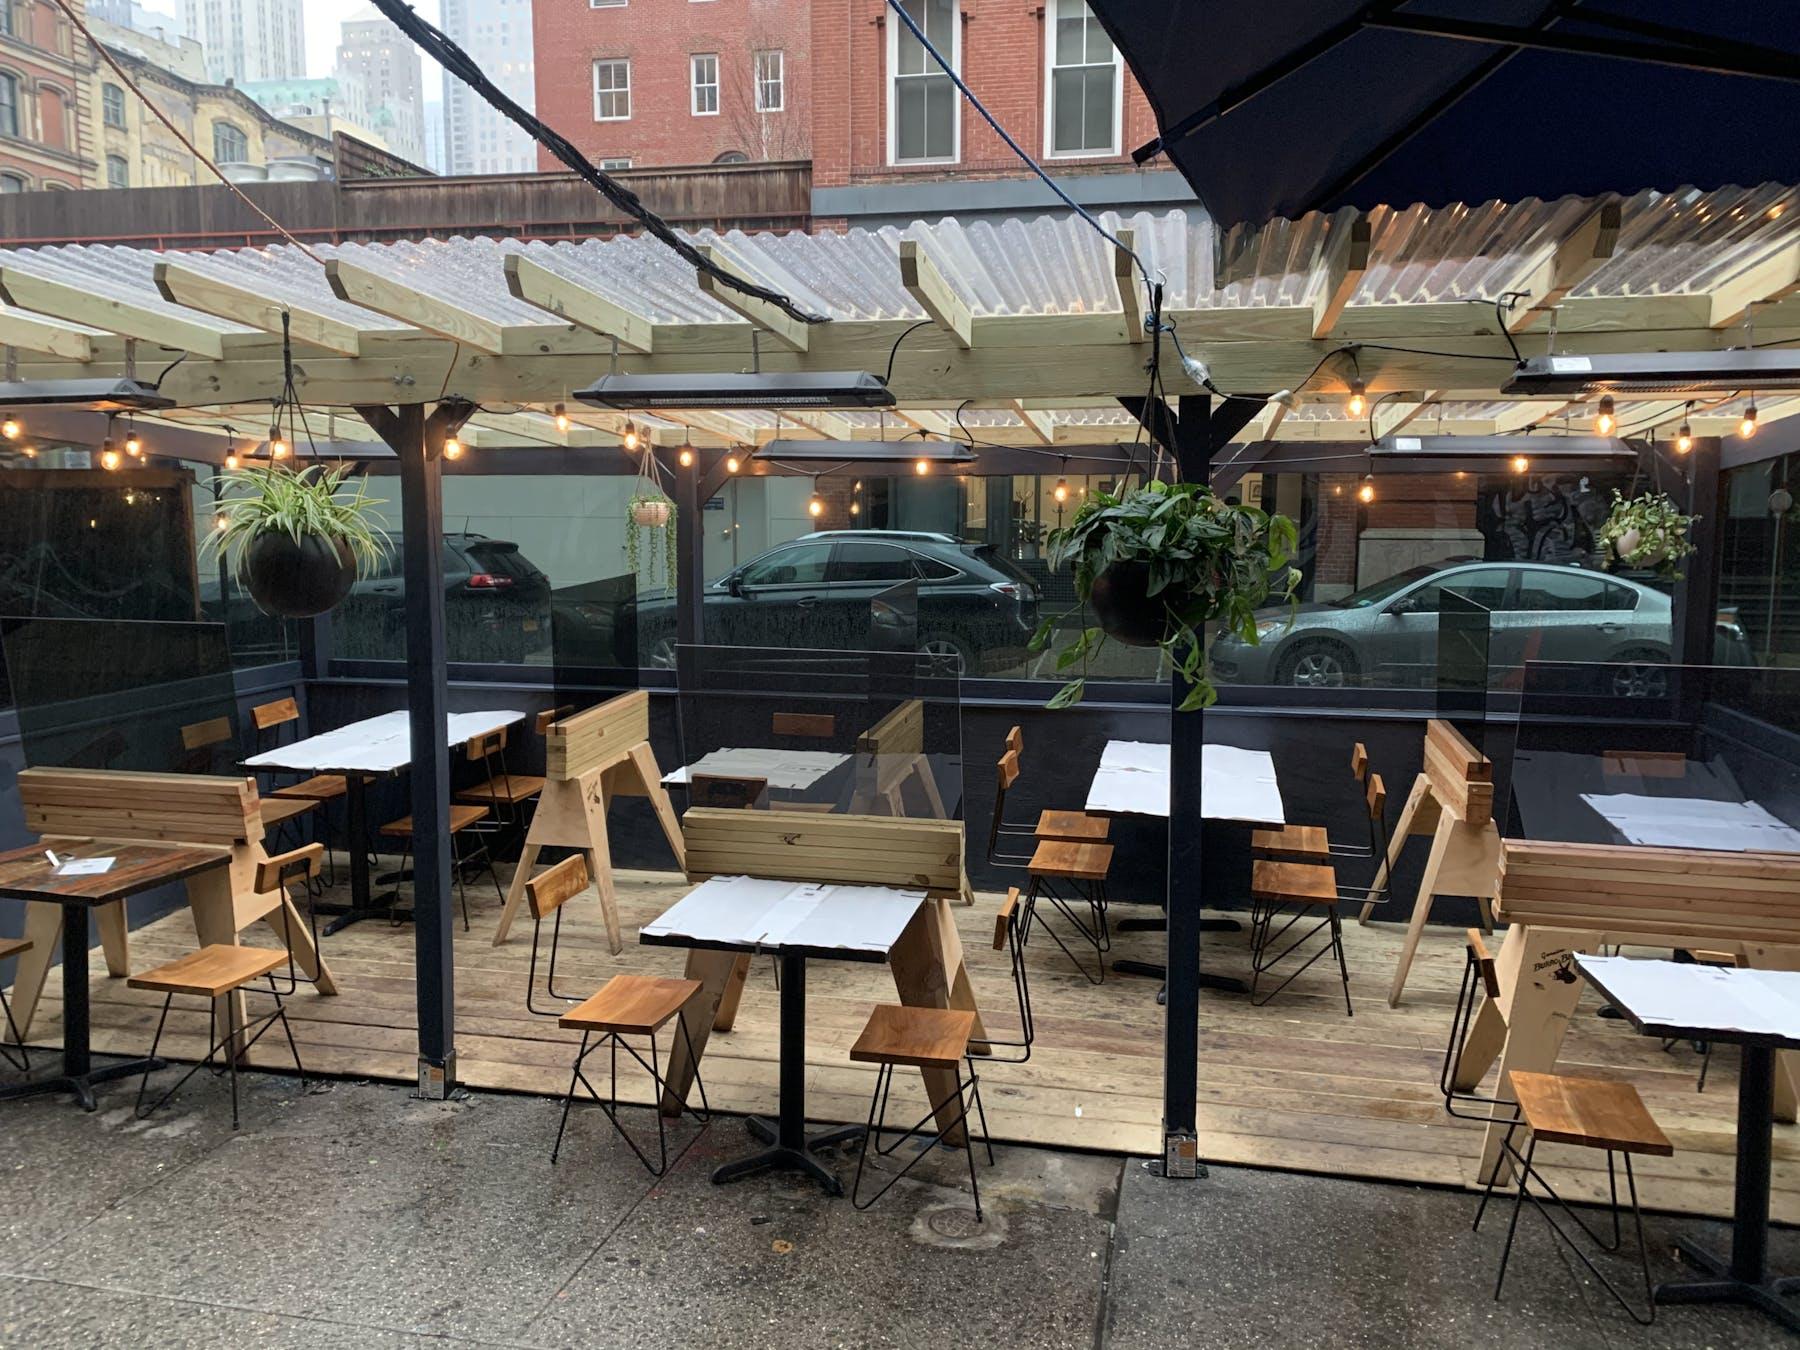 Khe-Yo Outdoor Cafe